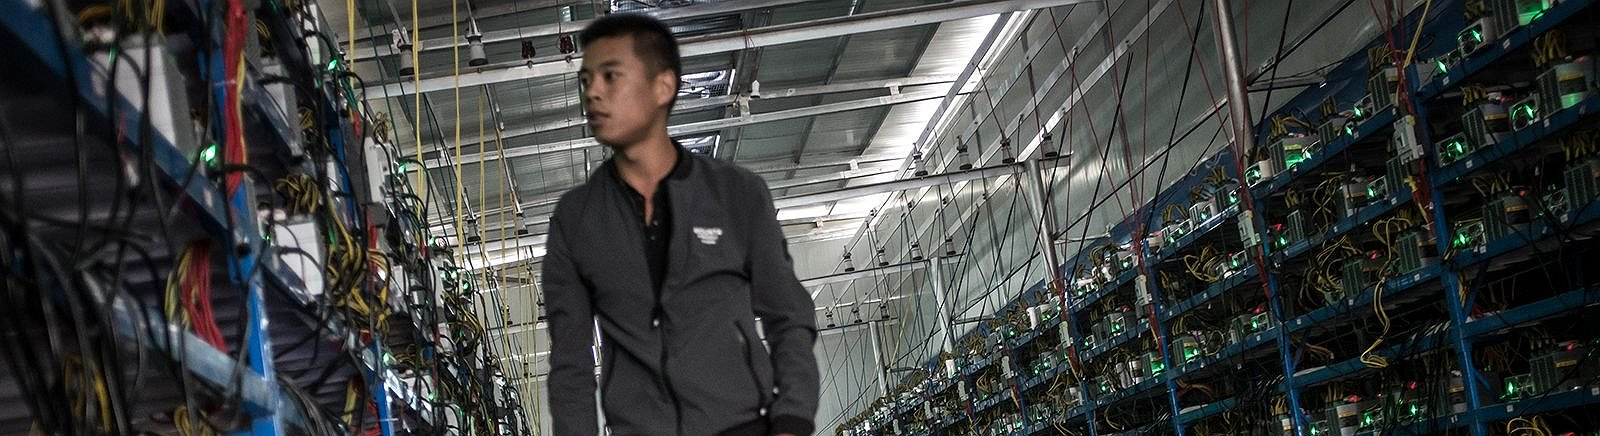 Как живут китайские биткоин-фермеры